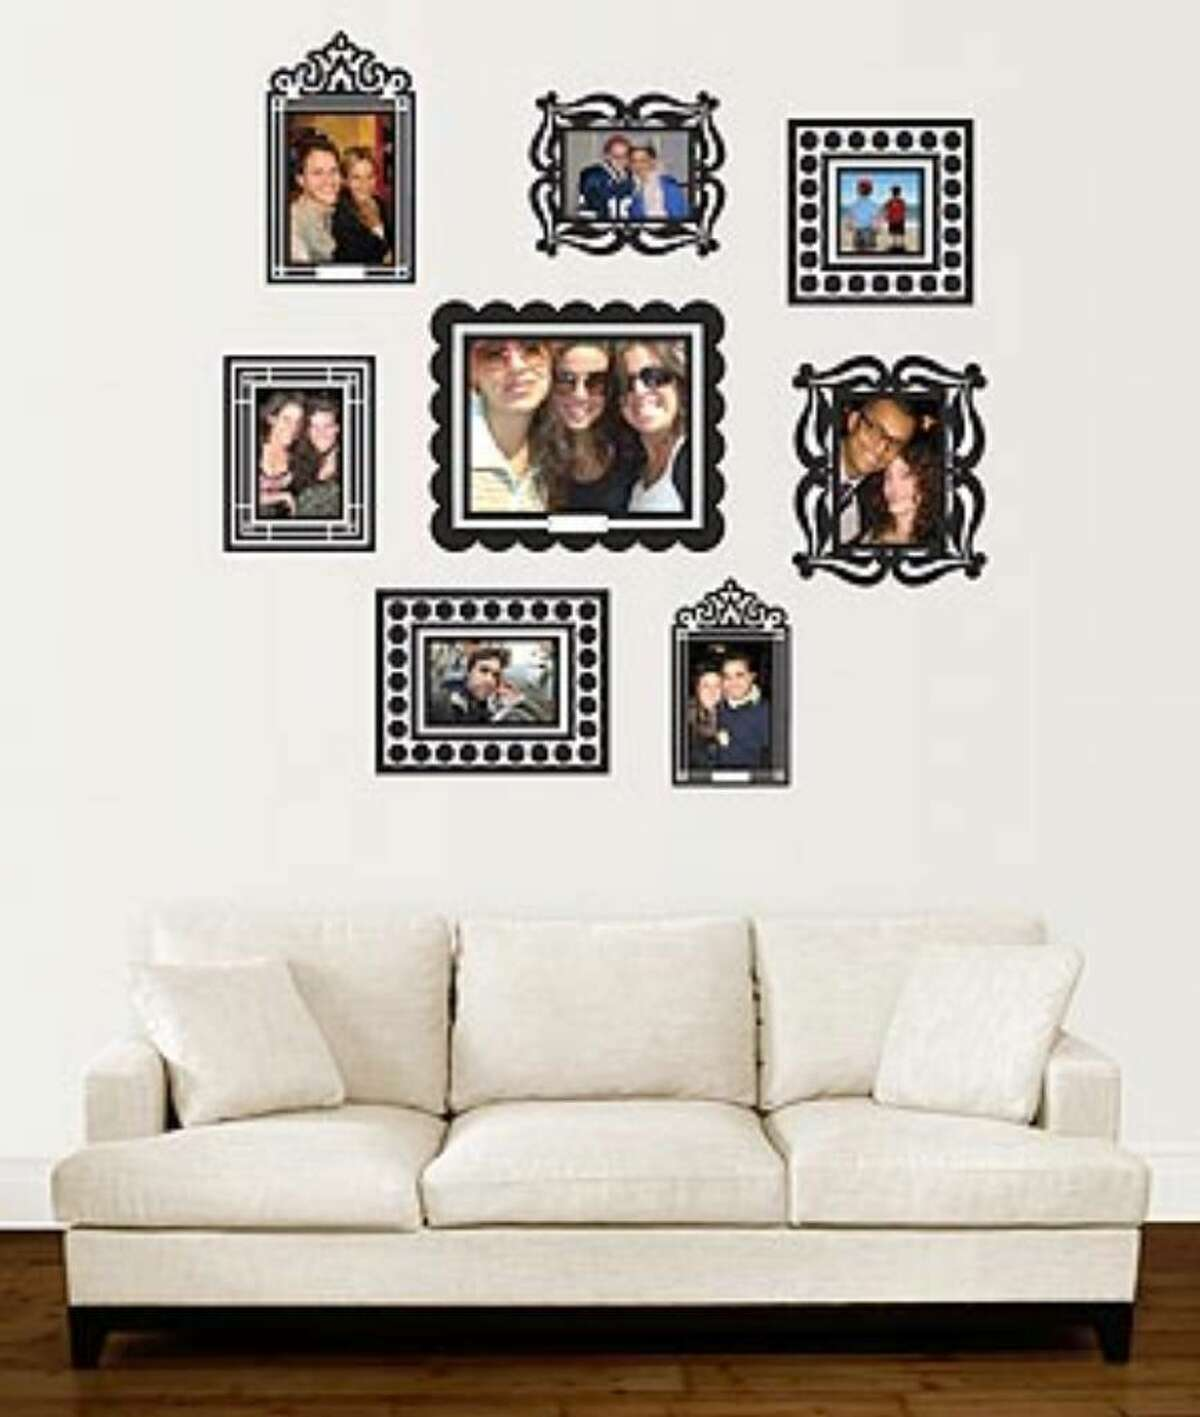 Stickr Frames, $19.95, DormCo.com: Removable adhesive